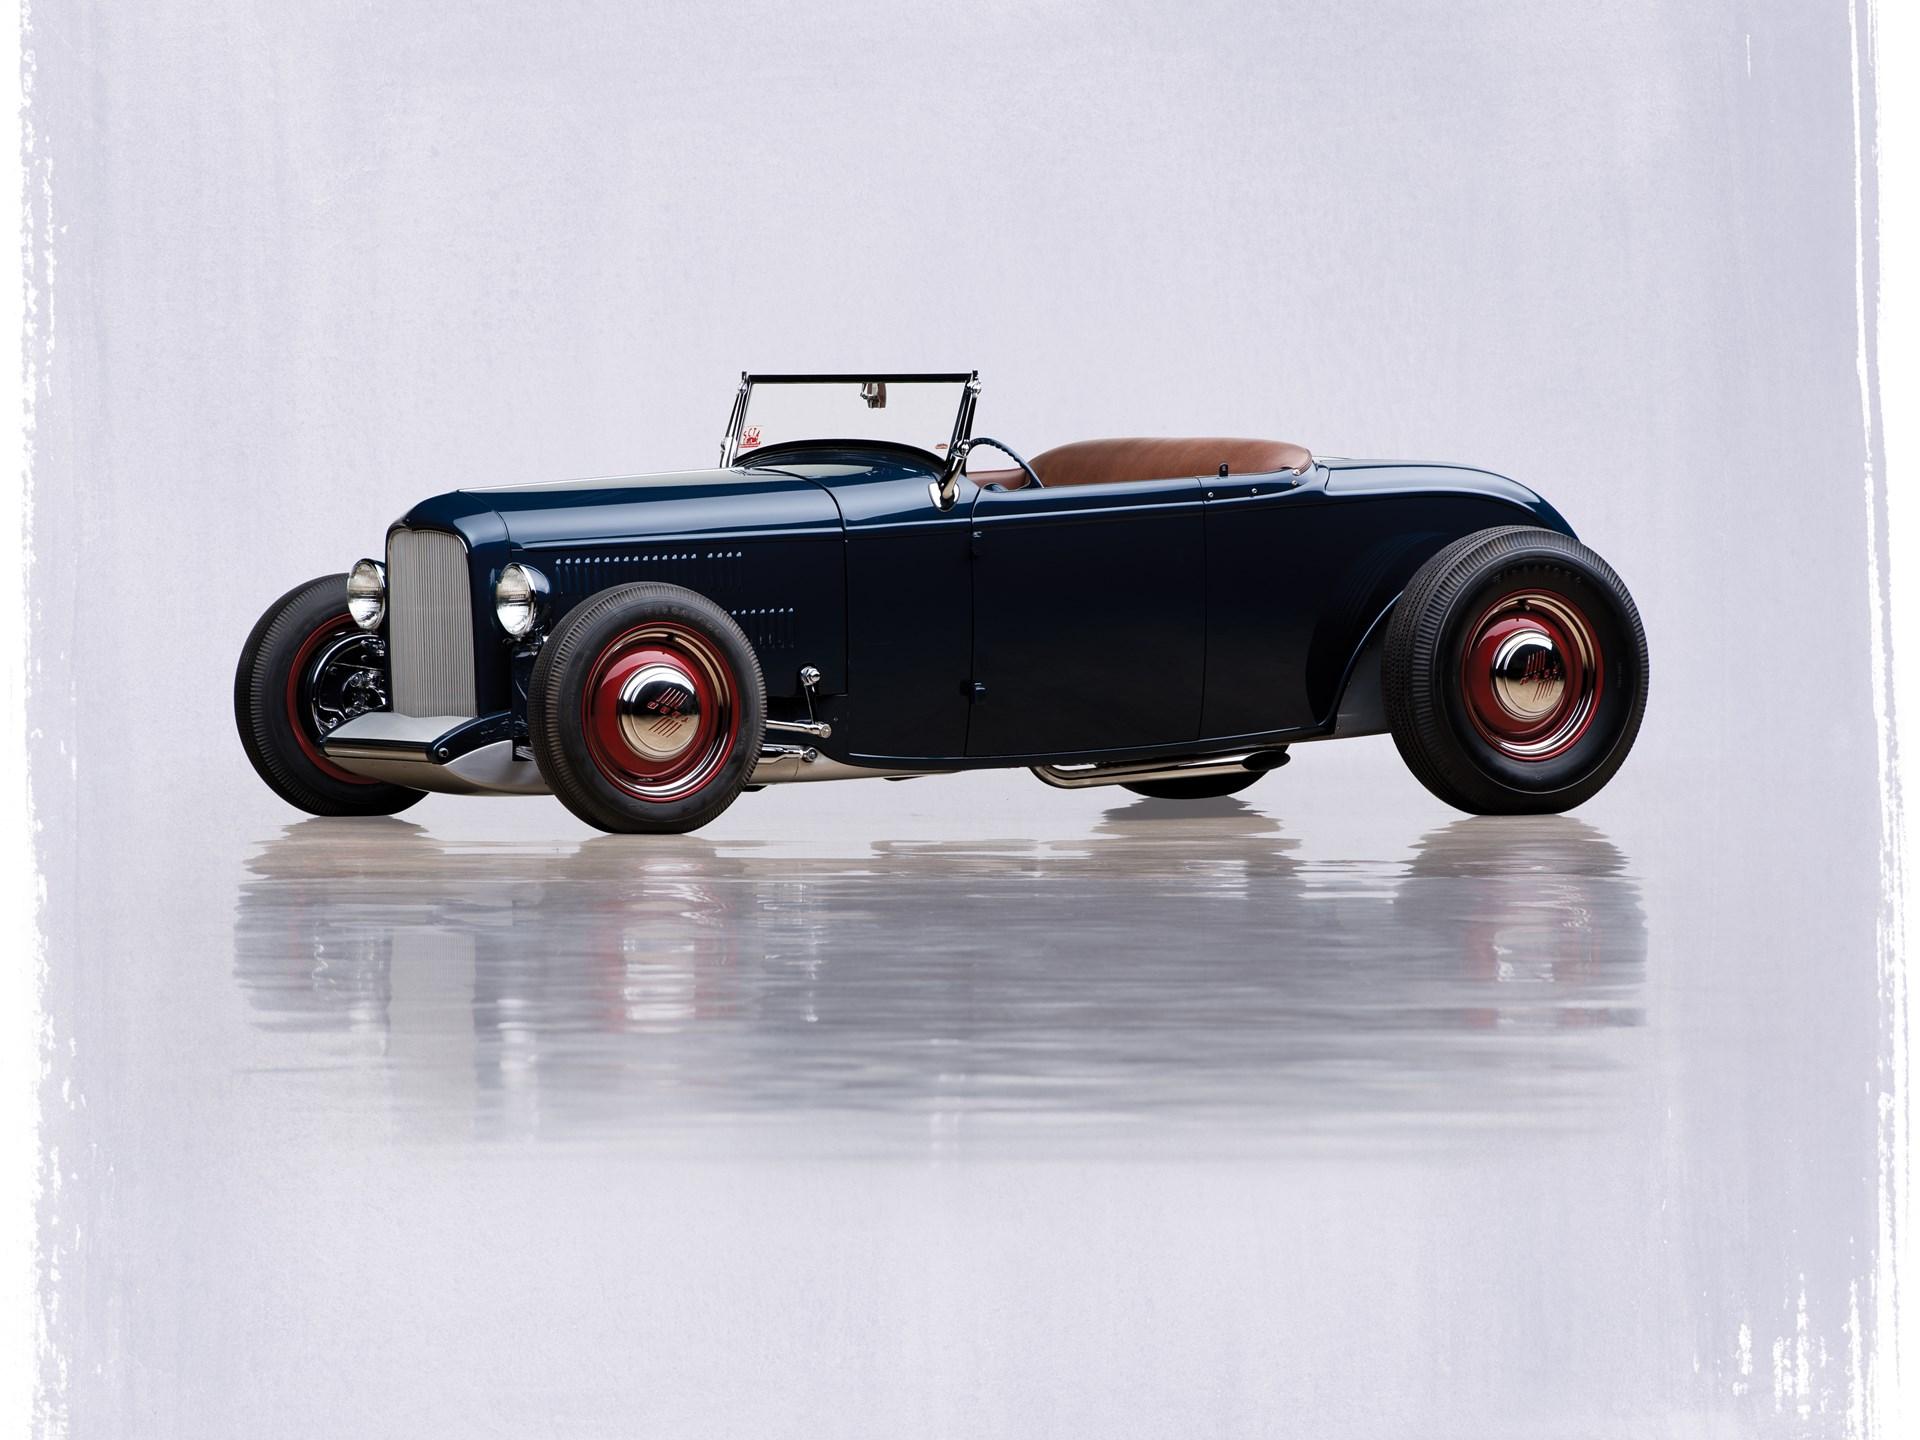 1932 Ford Lakes Roadster Custom by Khougaz